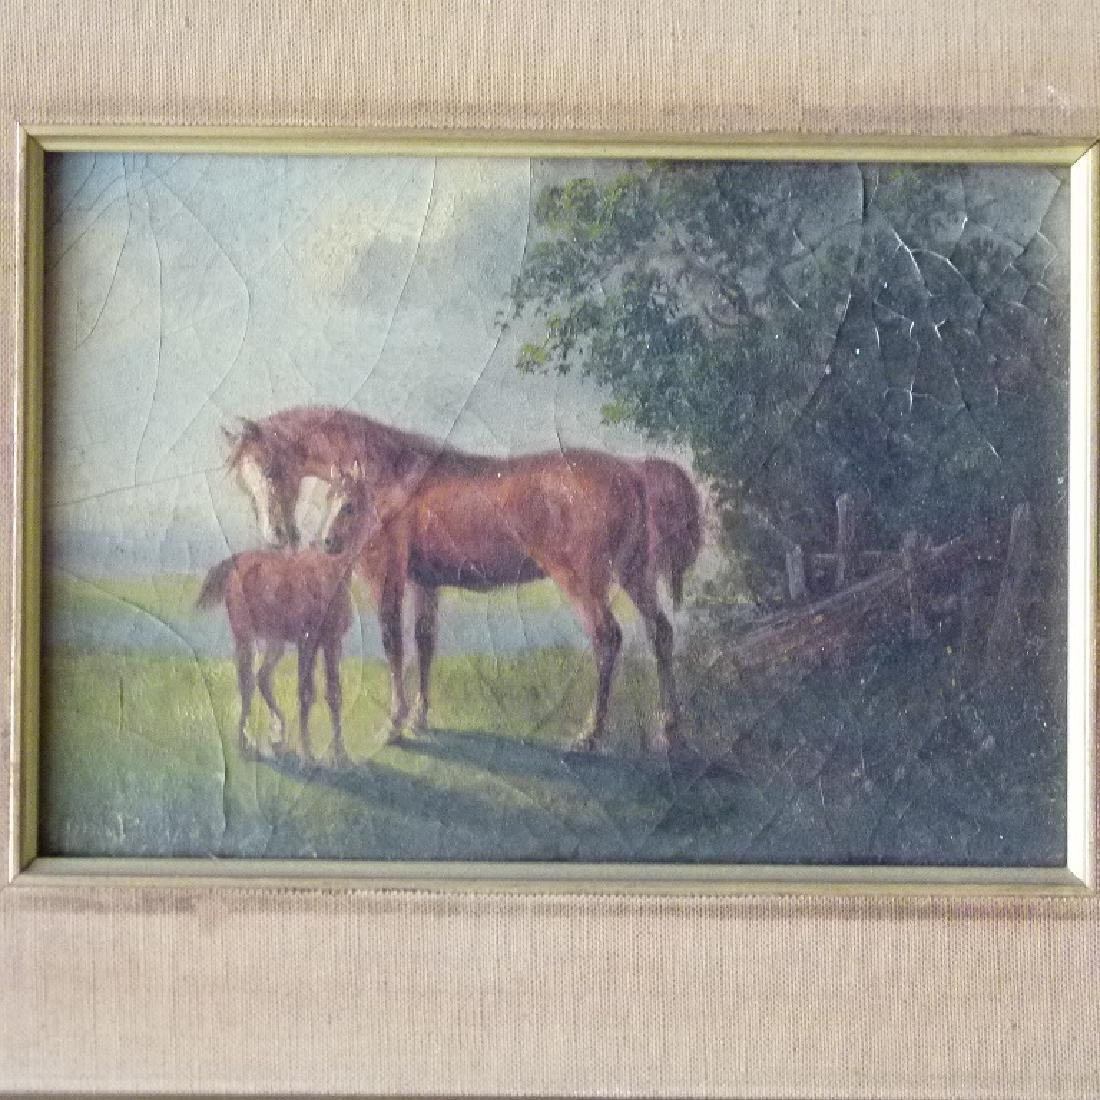 LOT (2) O/B HORSES W/ LANDSCAPE SIGNED OTTO PROGEL - 2